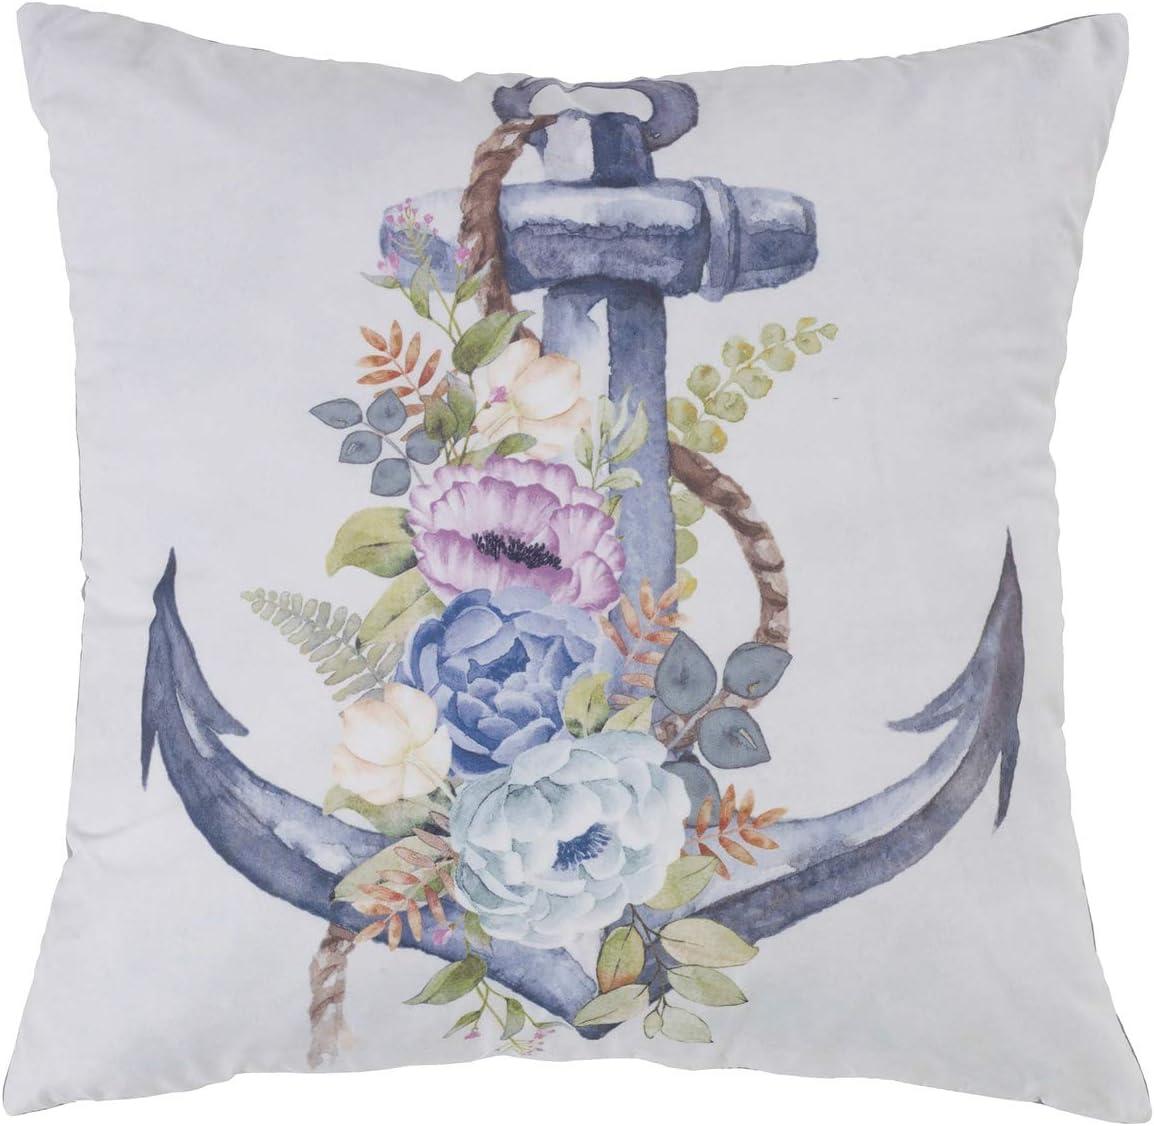 Donna Sharp Throw Pillow 数量限定 - Accessories Coastal Decorativ 安全 Bedding